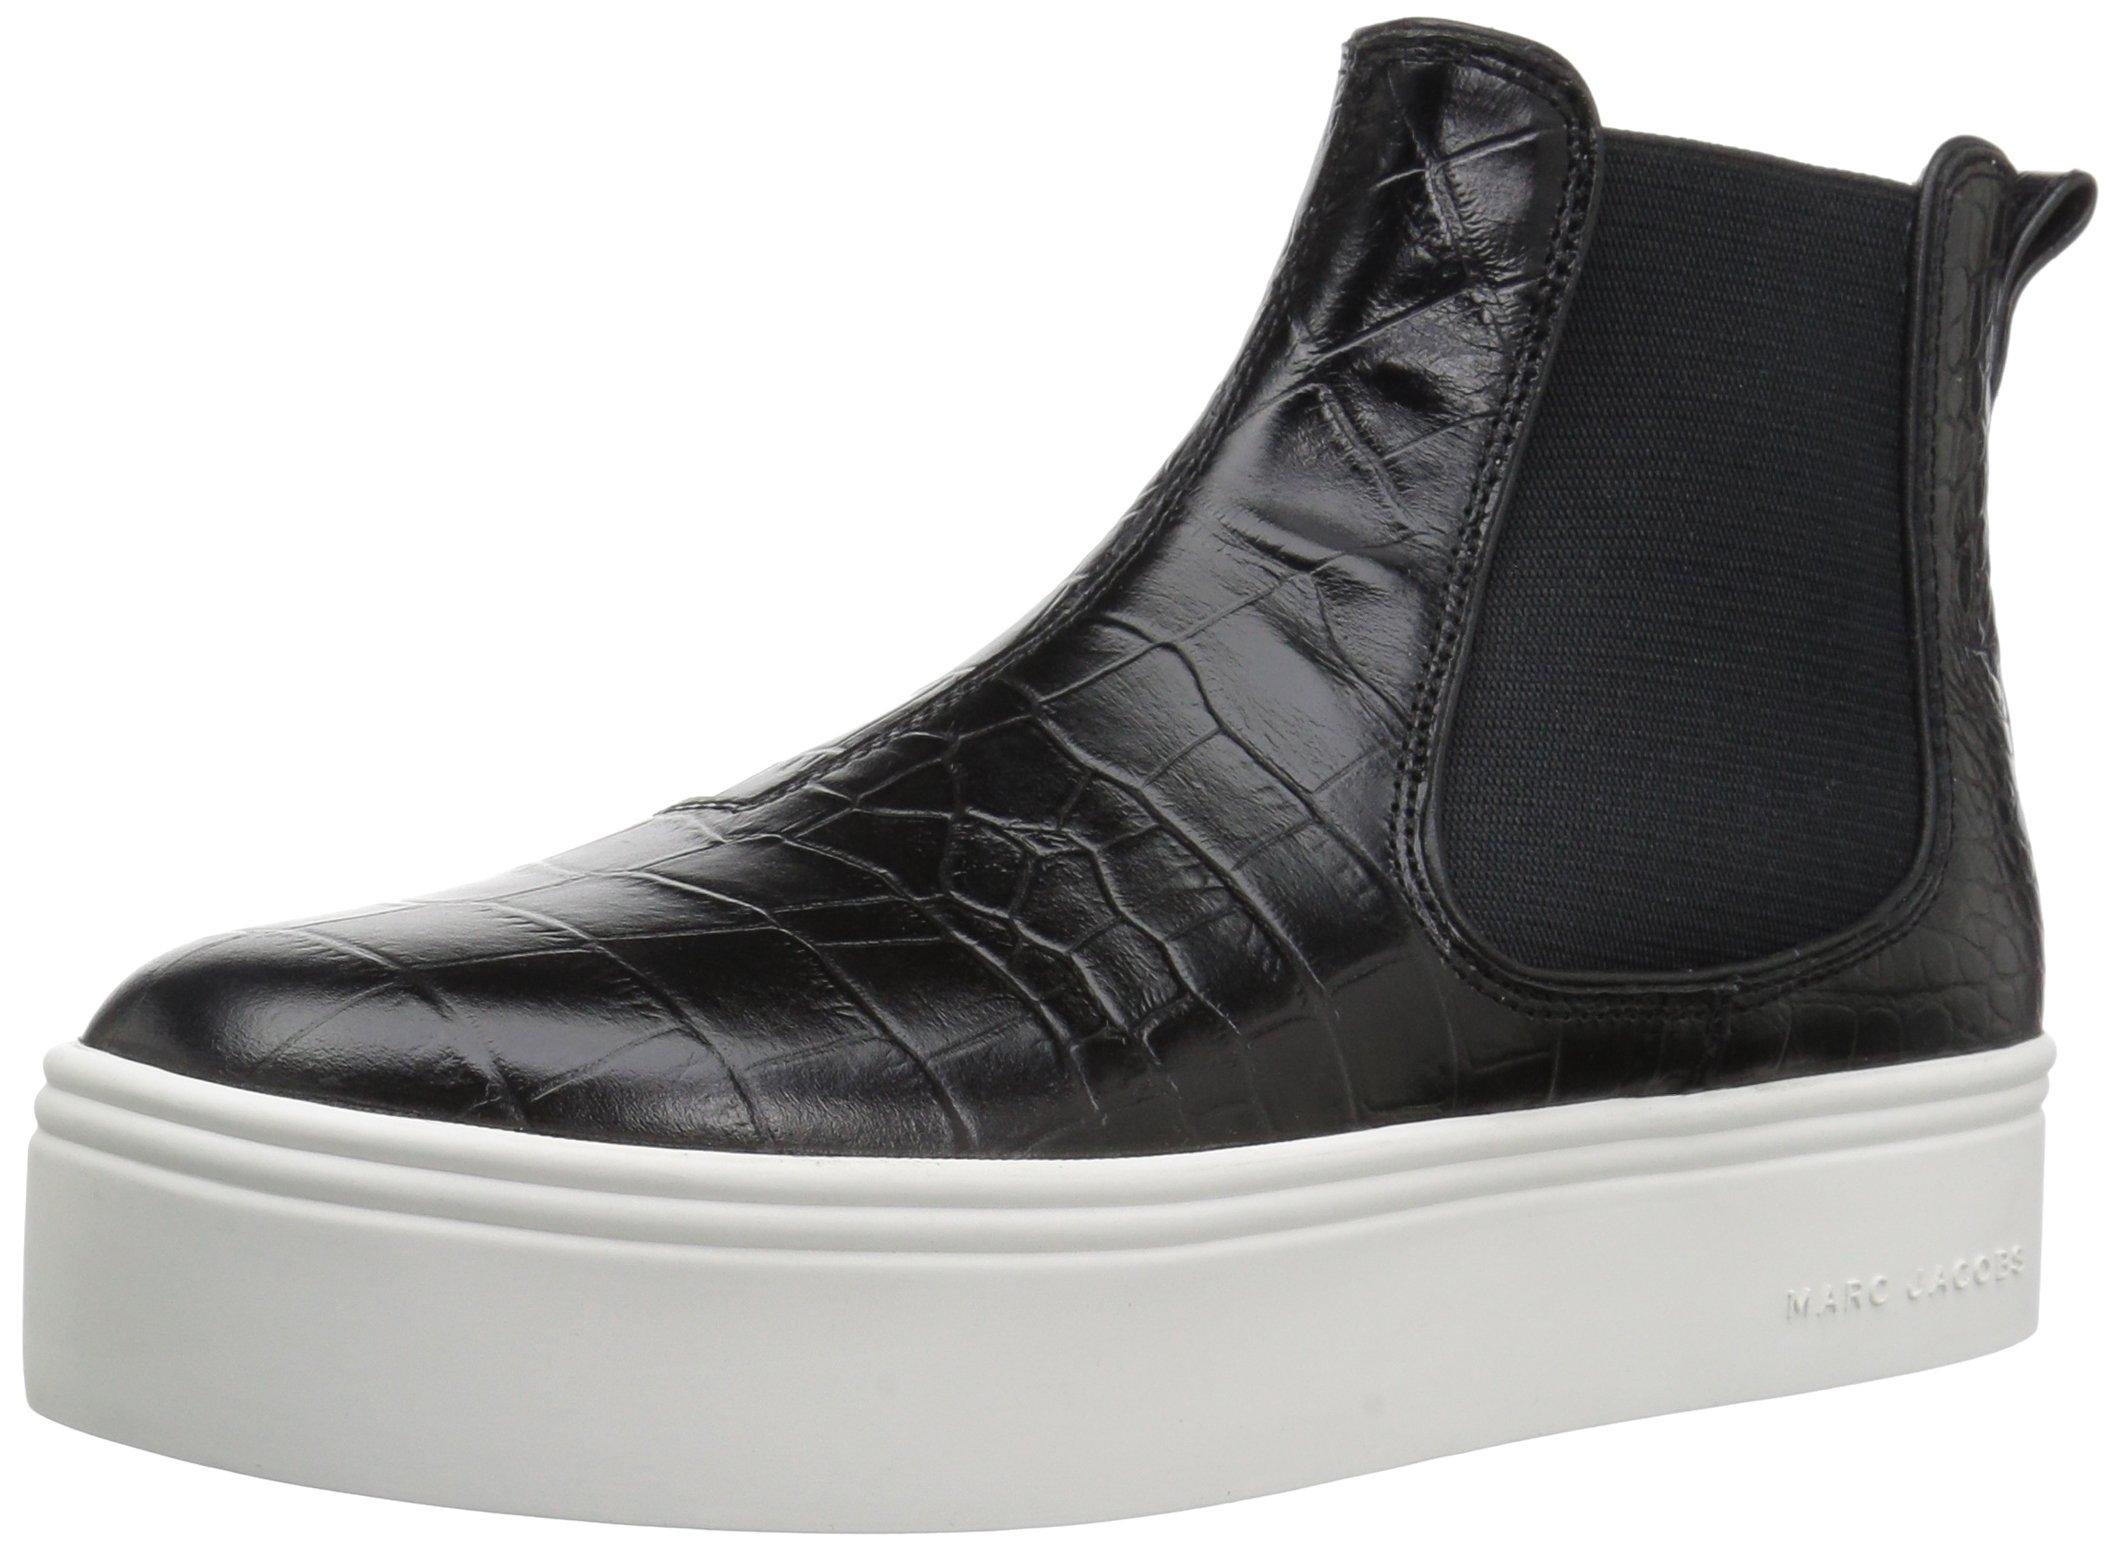 Marc Jacobs Women's Vesey Platform Hi Top Sneaker, Black, 35 M EU (5 US)